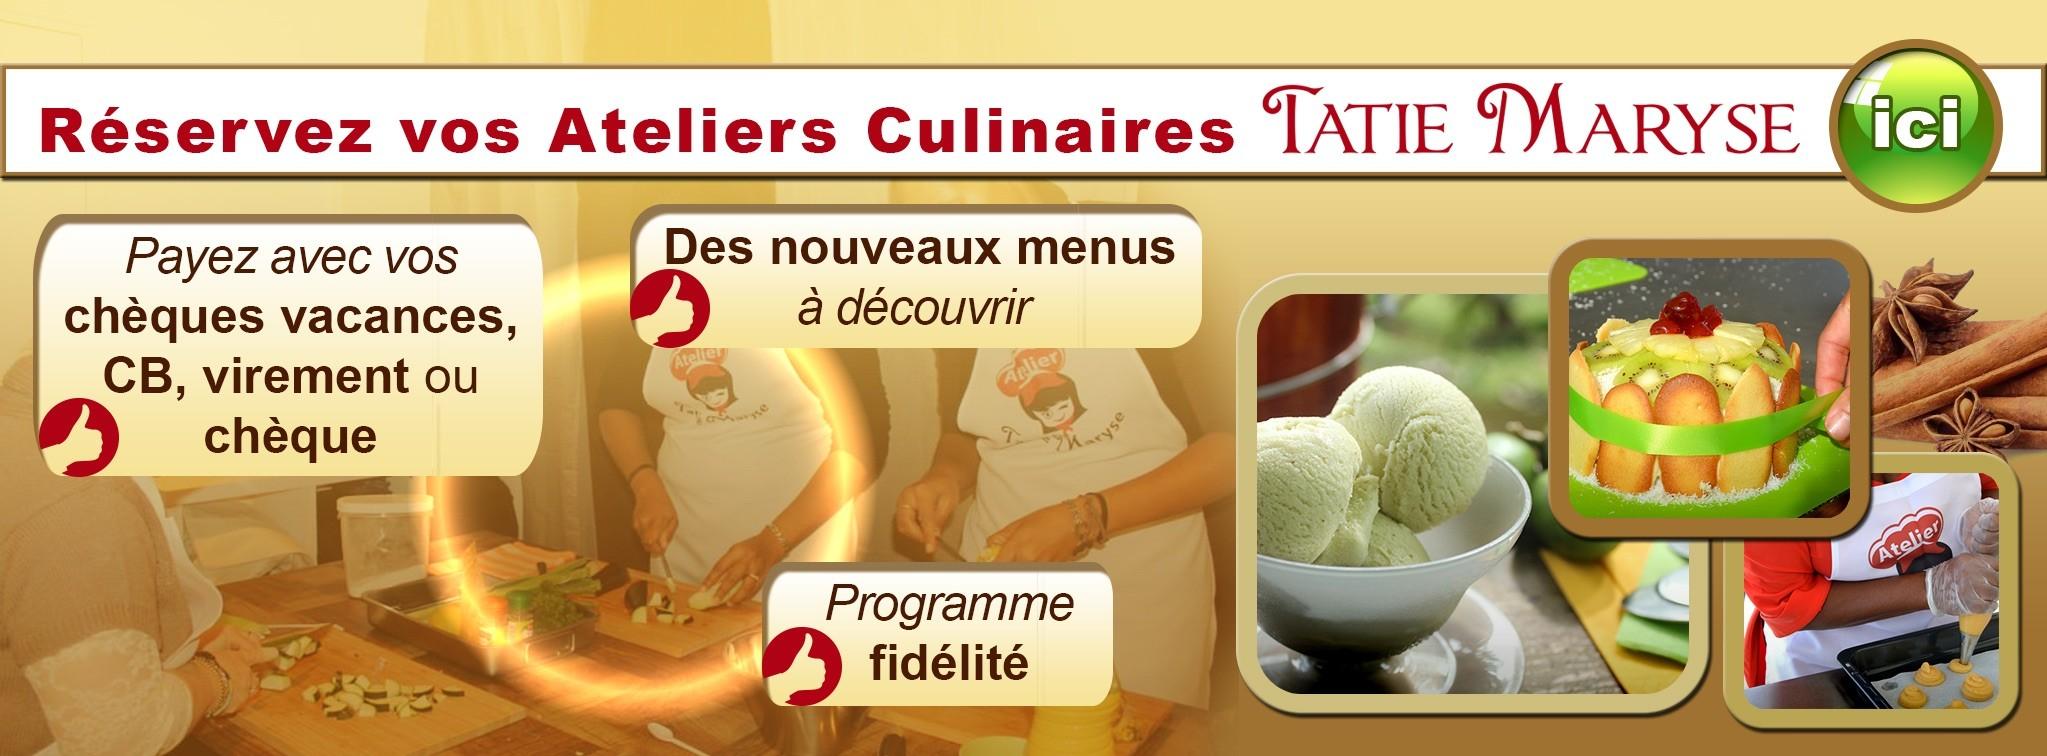 Ateliers cuisine antillaise